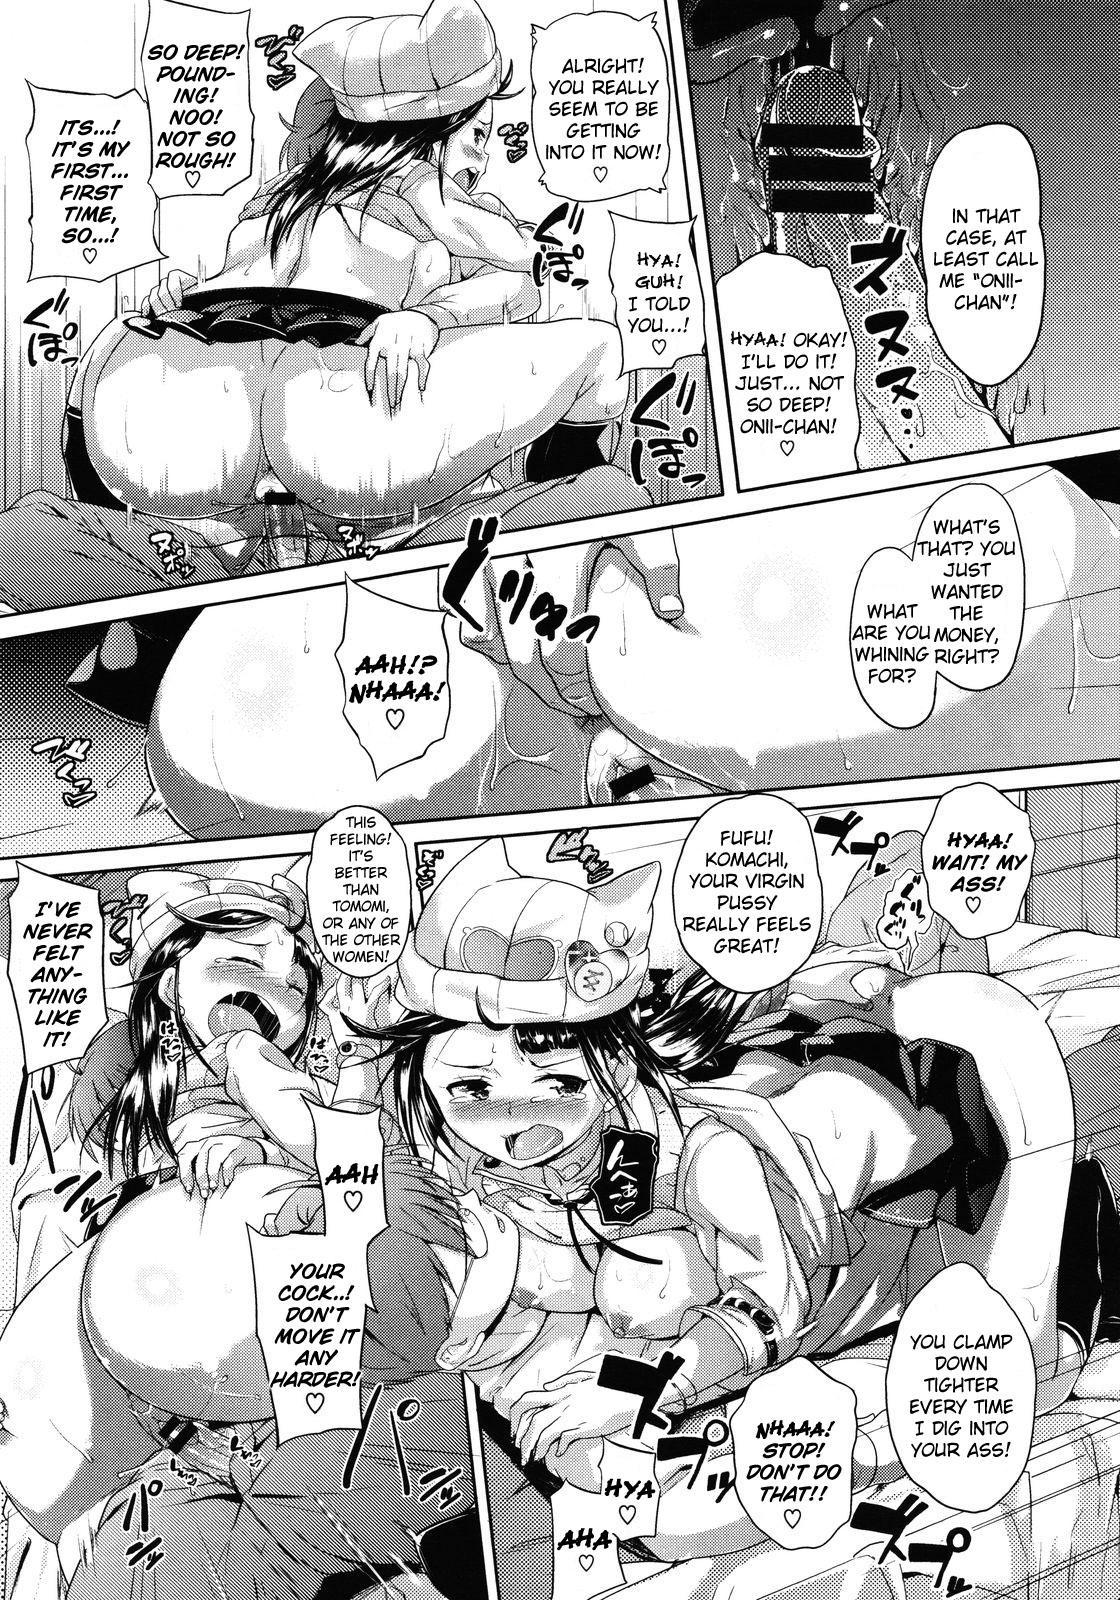 [Knuckle Curve] Kono Manga wa Onii-chan no Teikyou de Ookuri Shimasu | This Manga is an Offer From Onii-chan (COMIC Megastore 2012-01) [English] {doujin-moe.us} 20